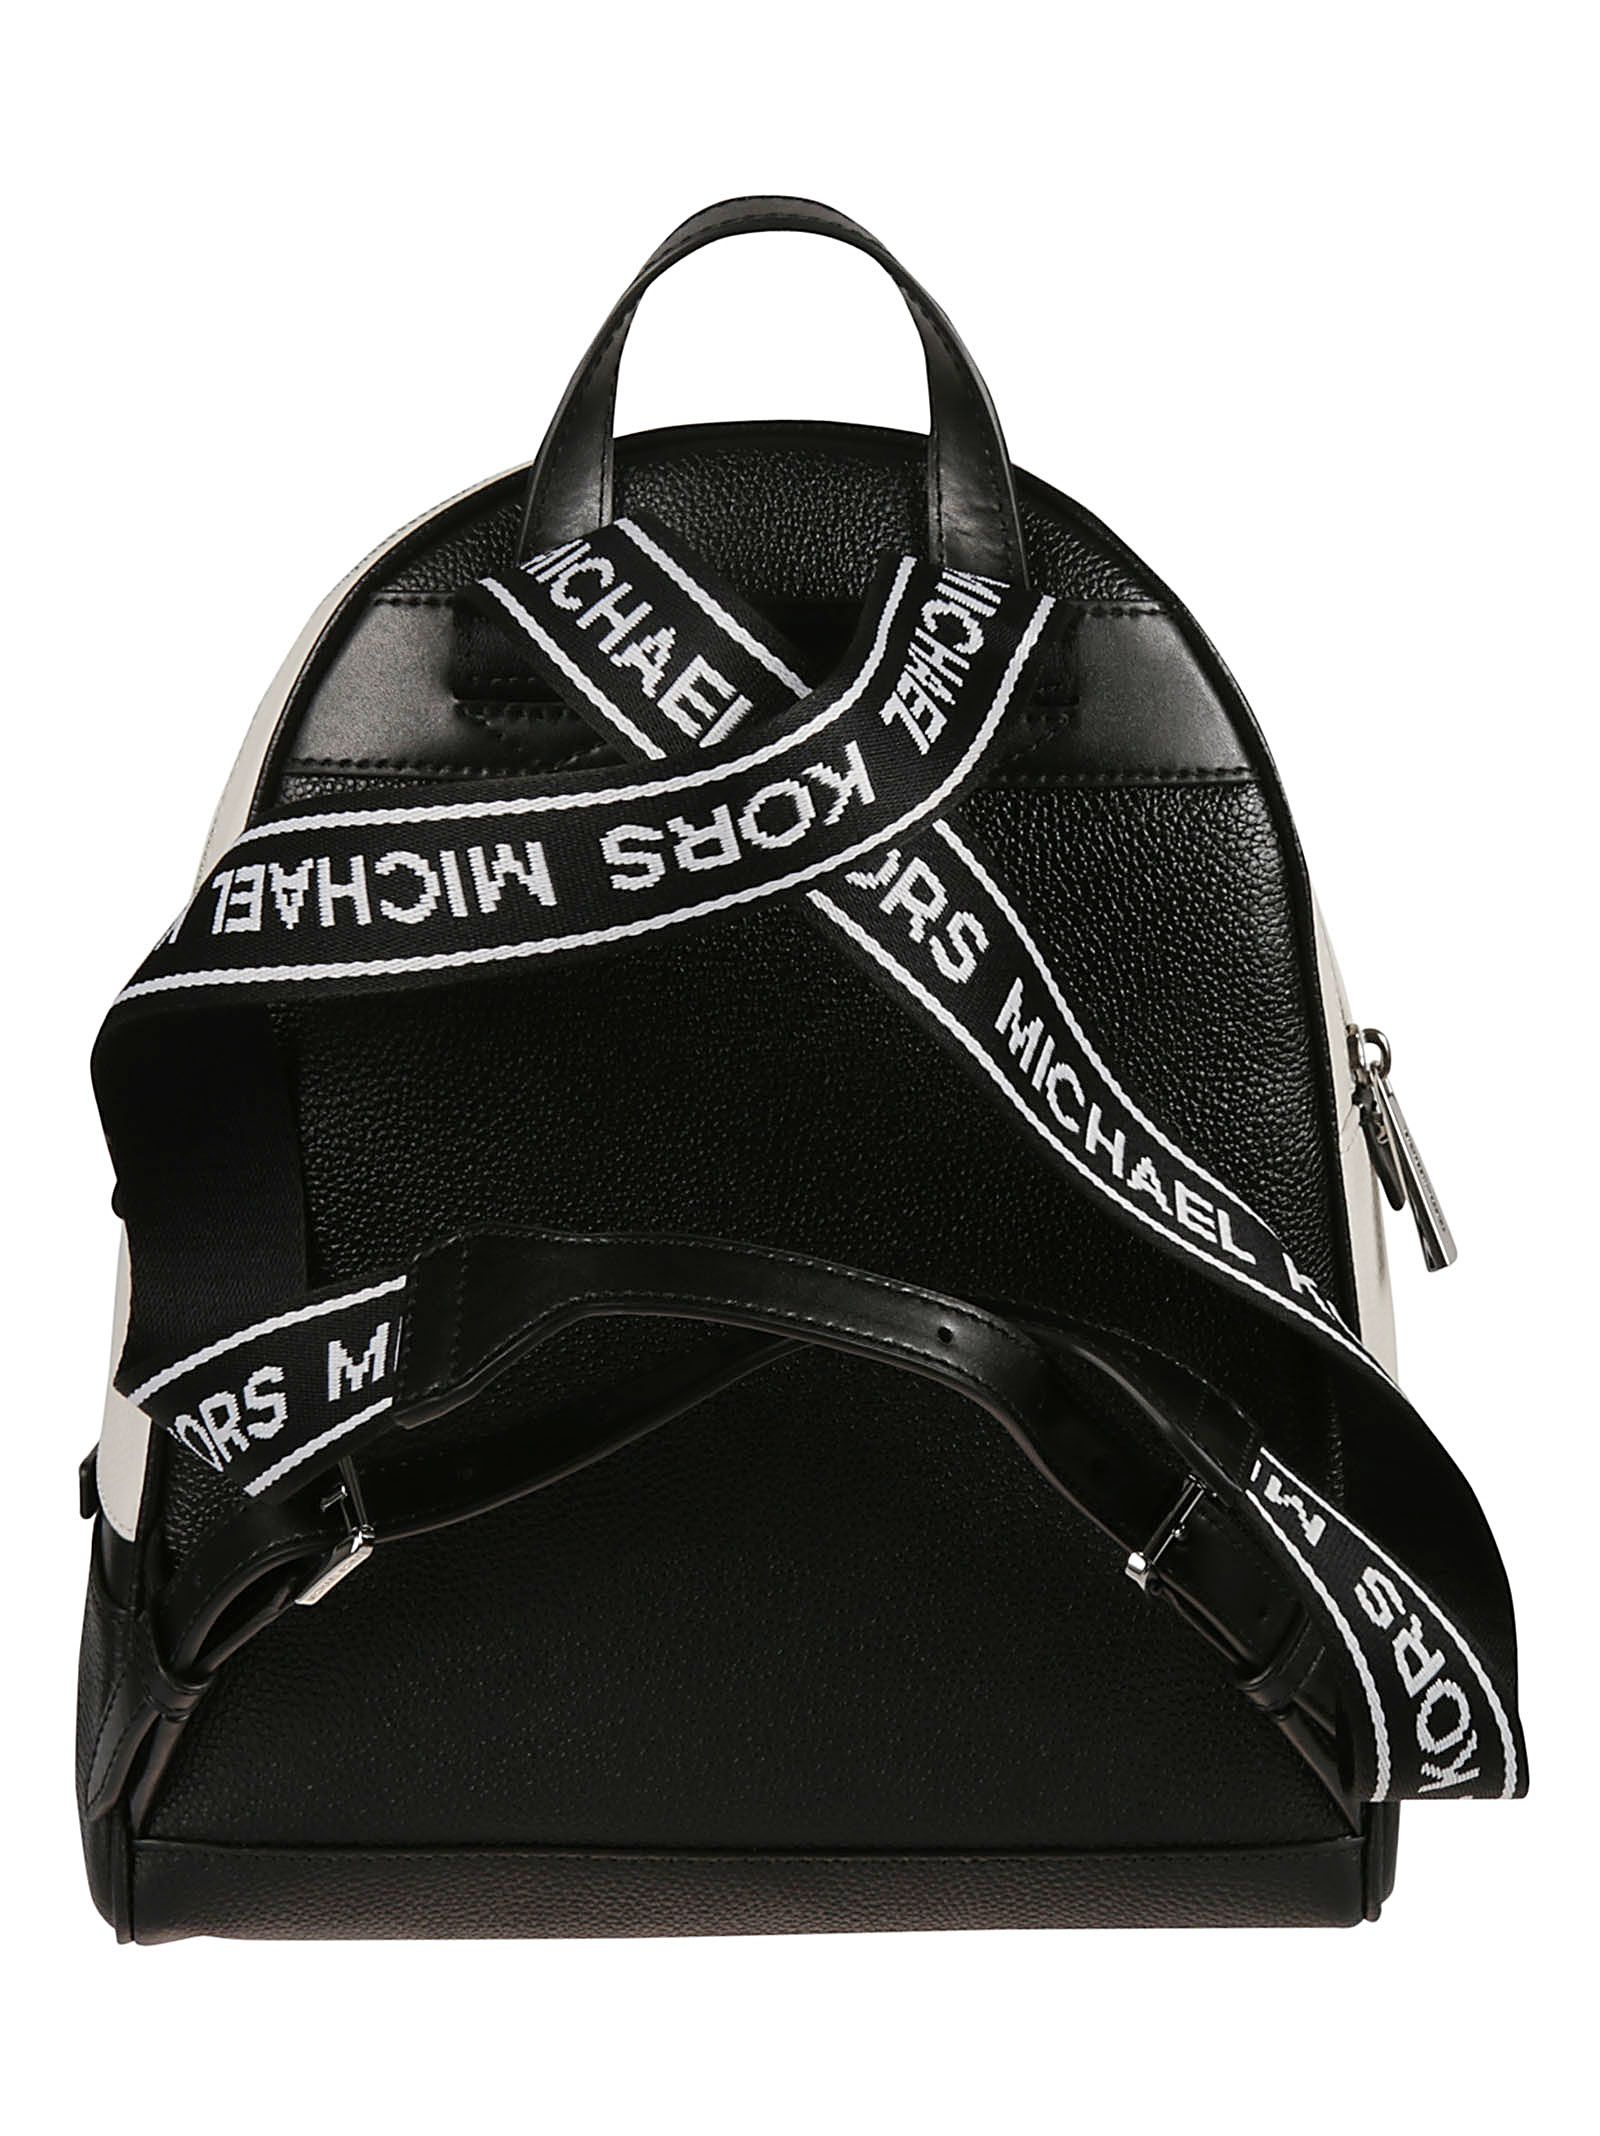 Michael Kors Michael Kors Rhea Backpack - Black optic white ... 3a26d63b92329